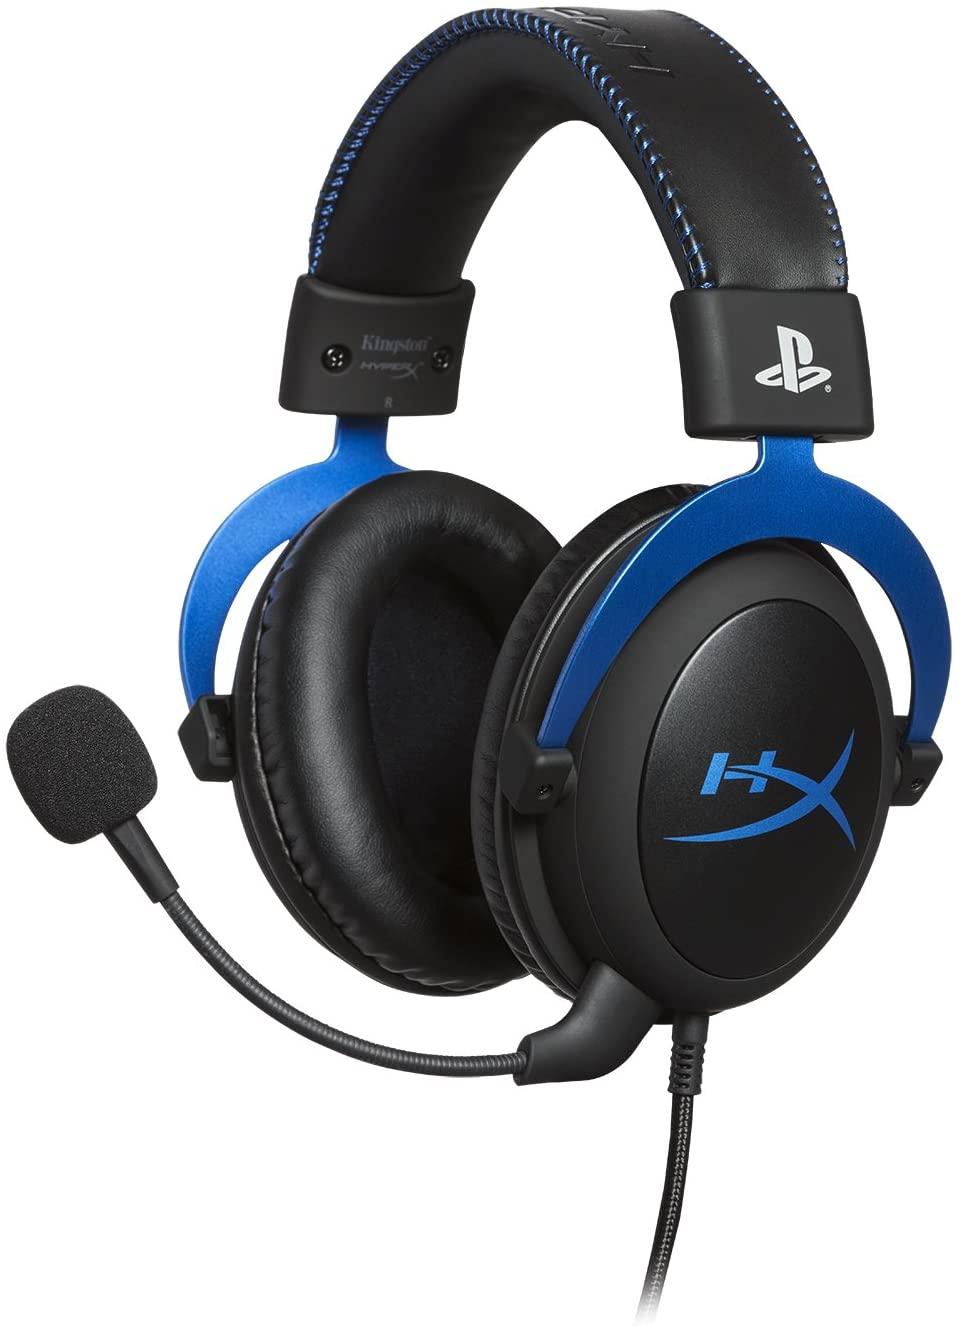 HyperX HX-HSCLS-BL Cloud para PS4 - Con Control de Audio Integrado